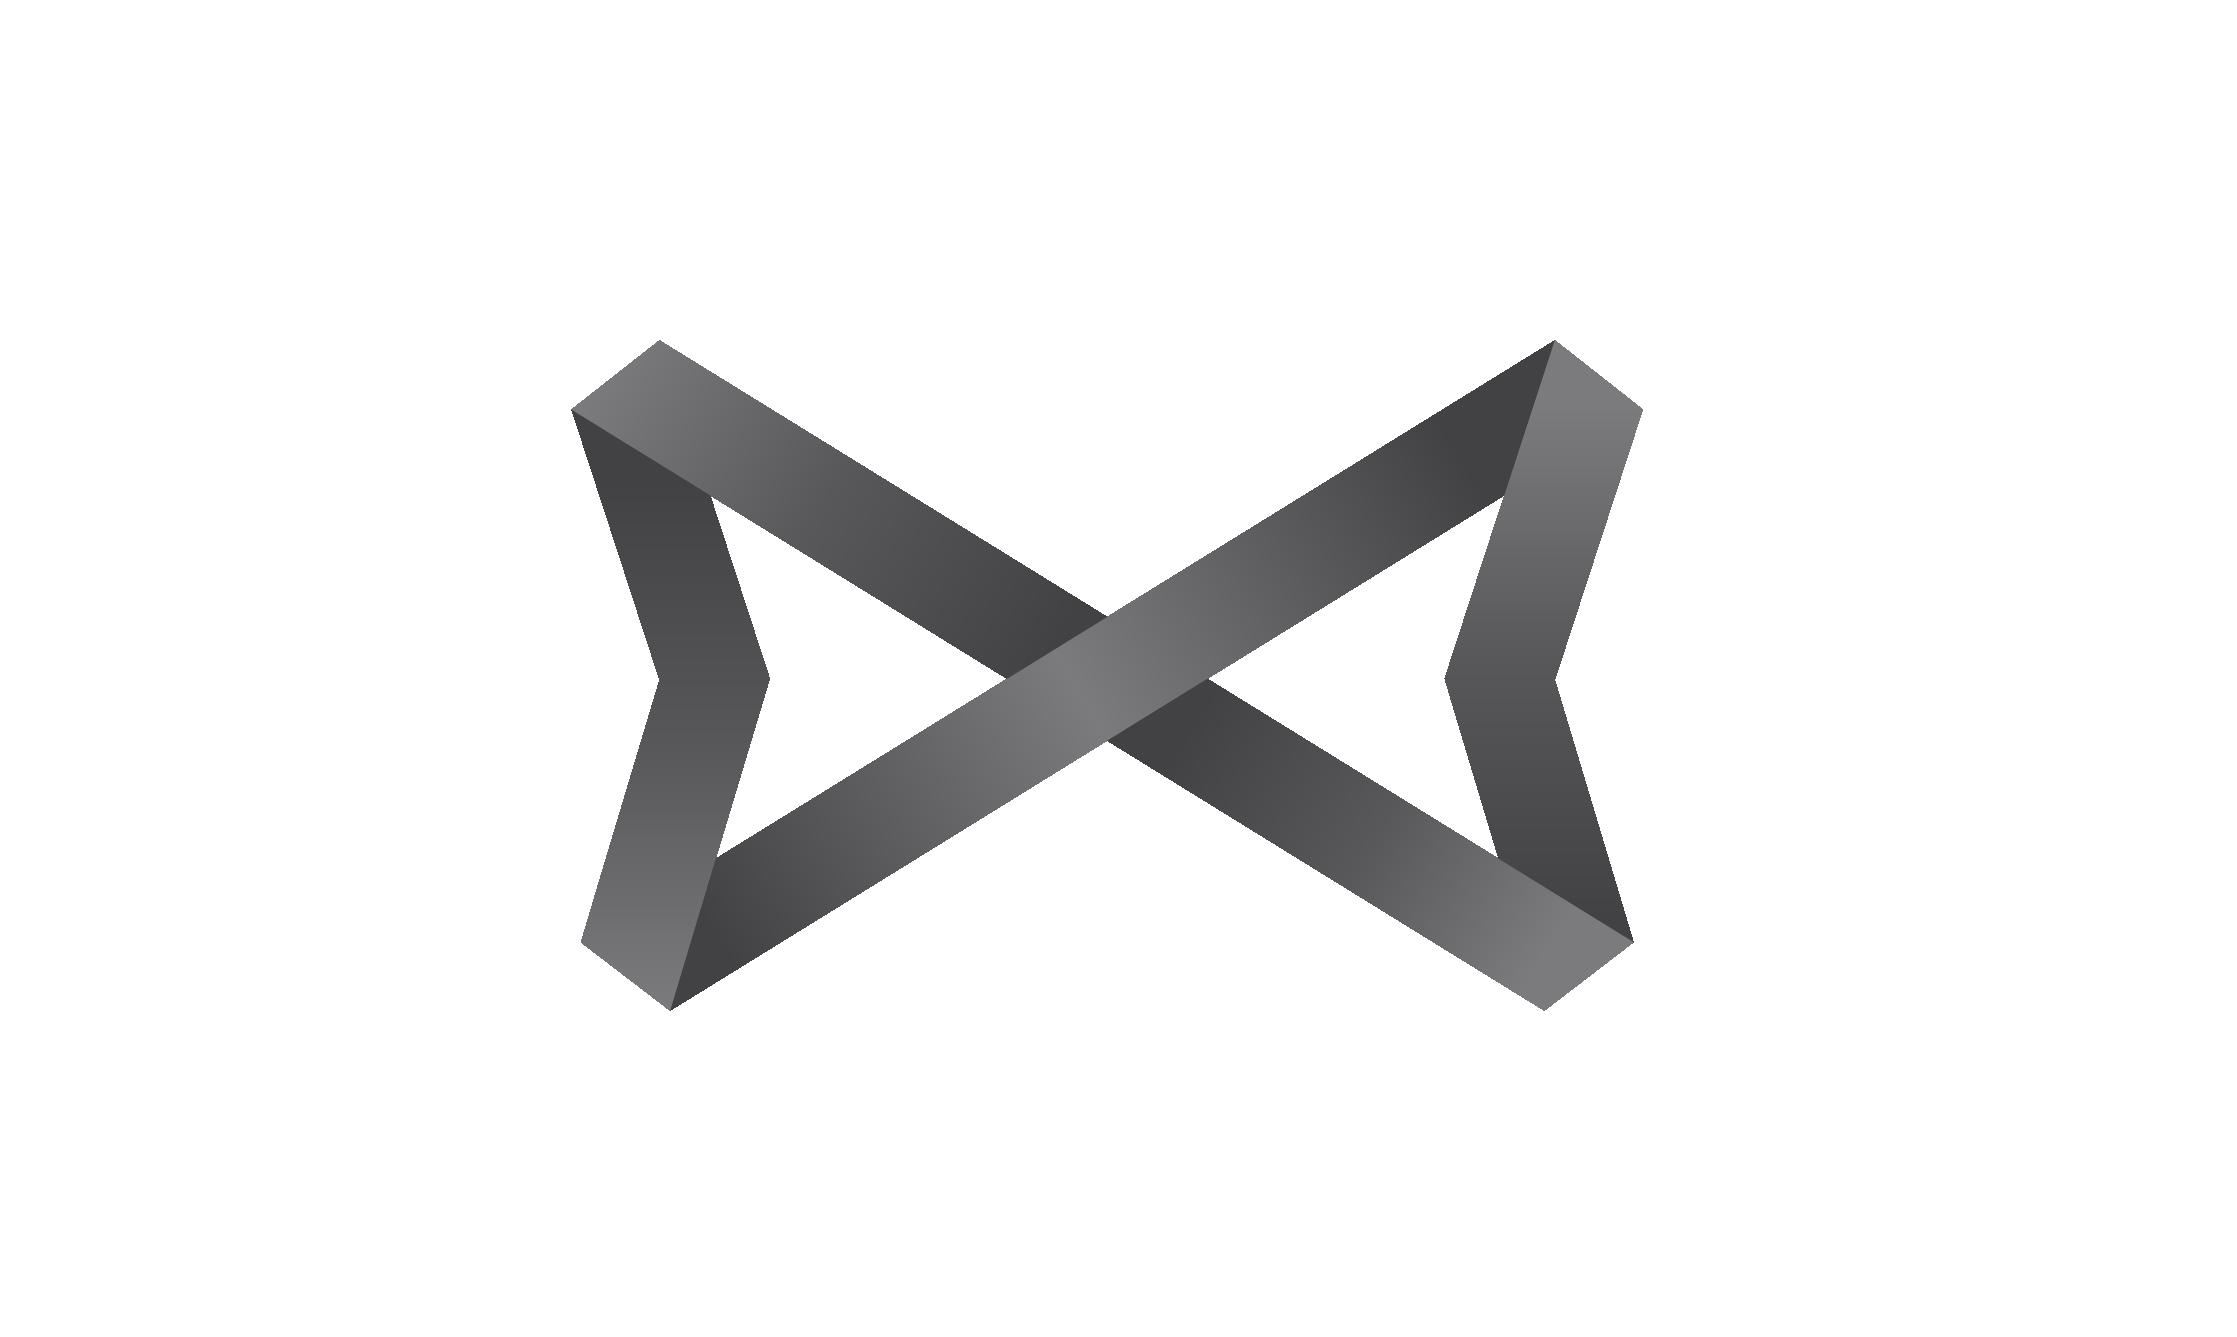 Intrinio | Free Stock Price API for Developers | 300+ Financial Data